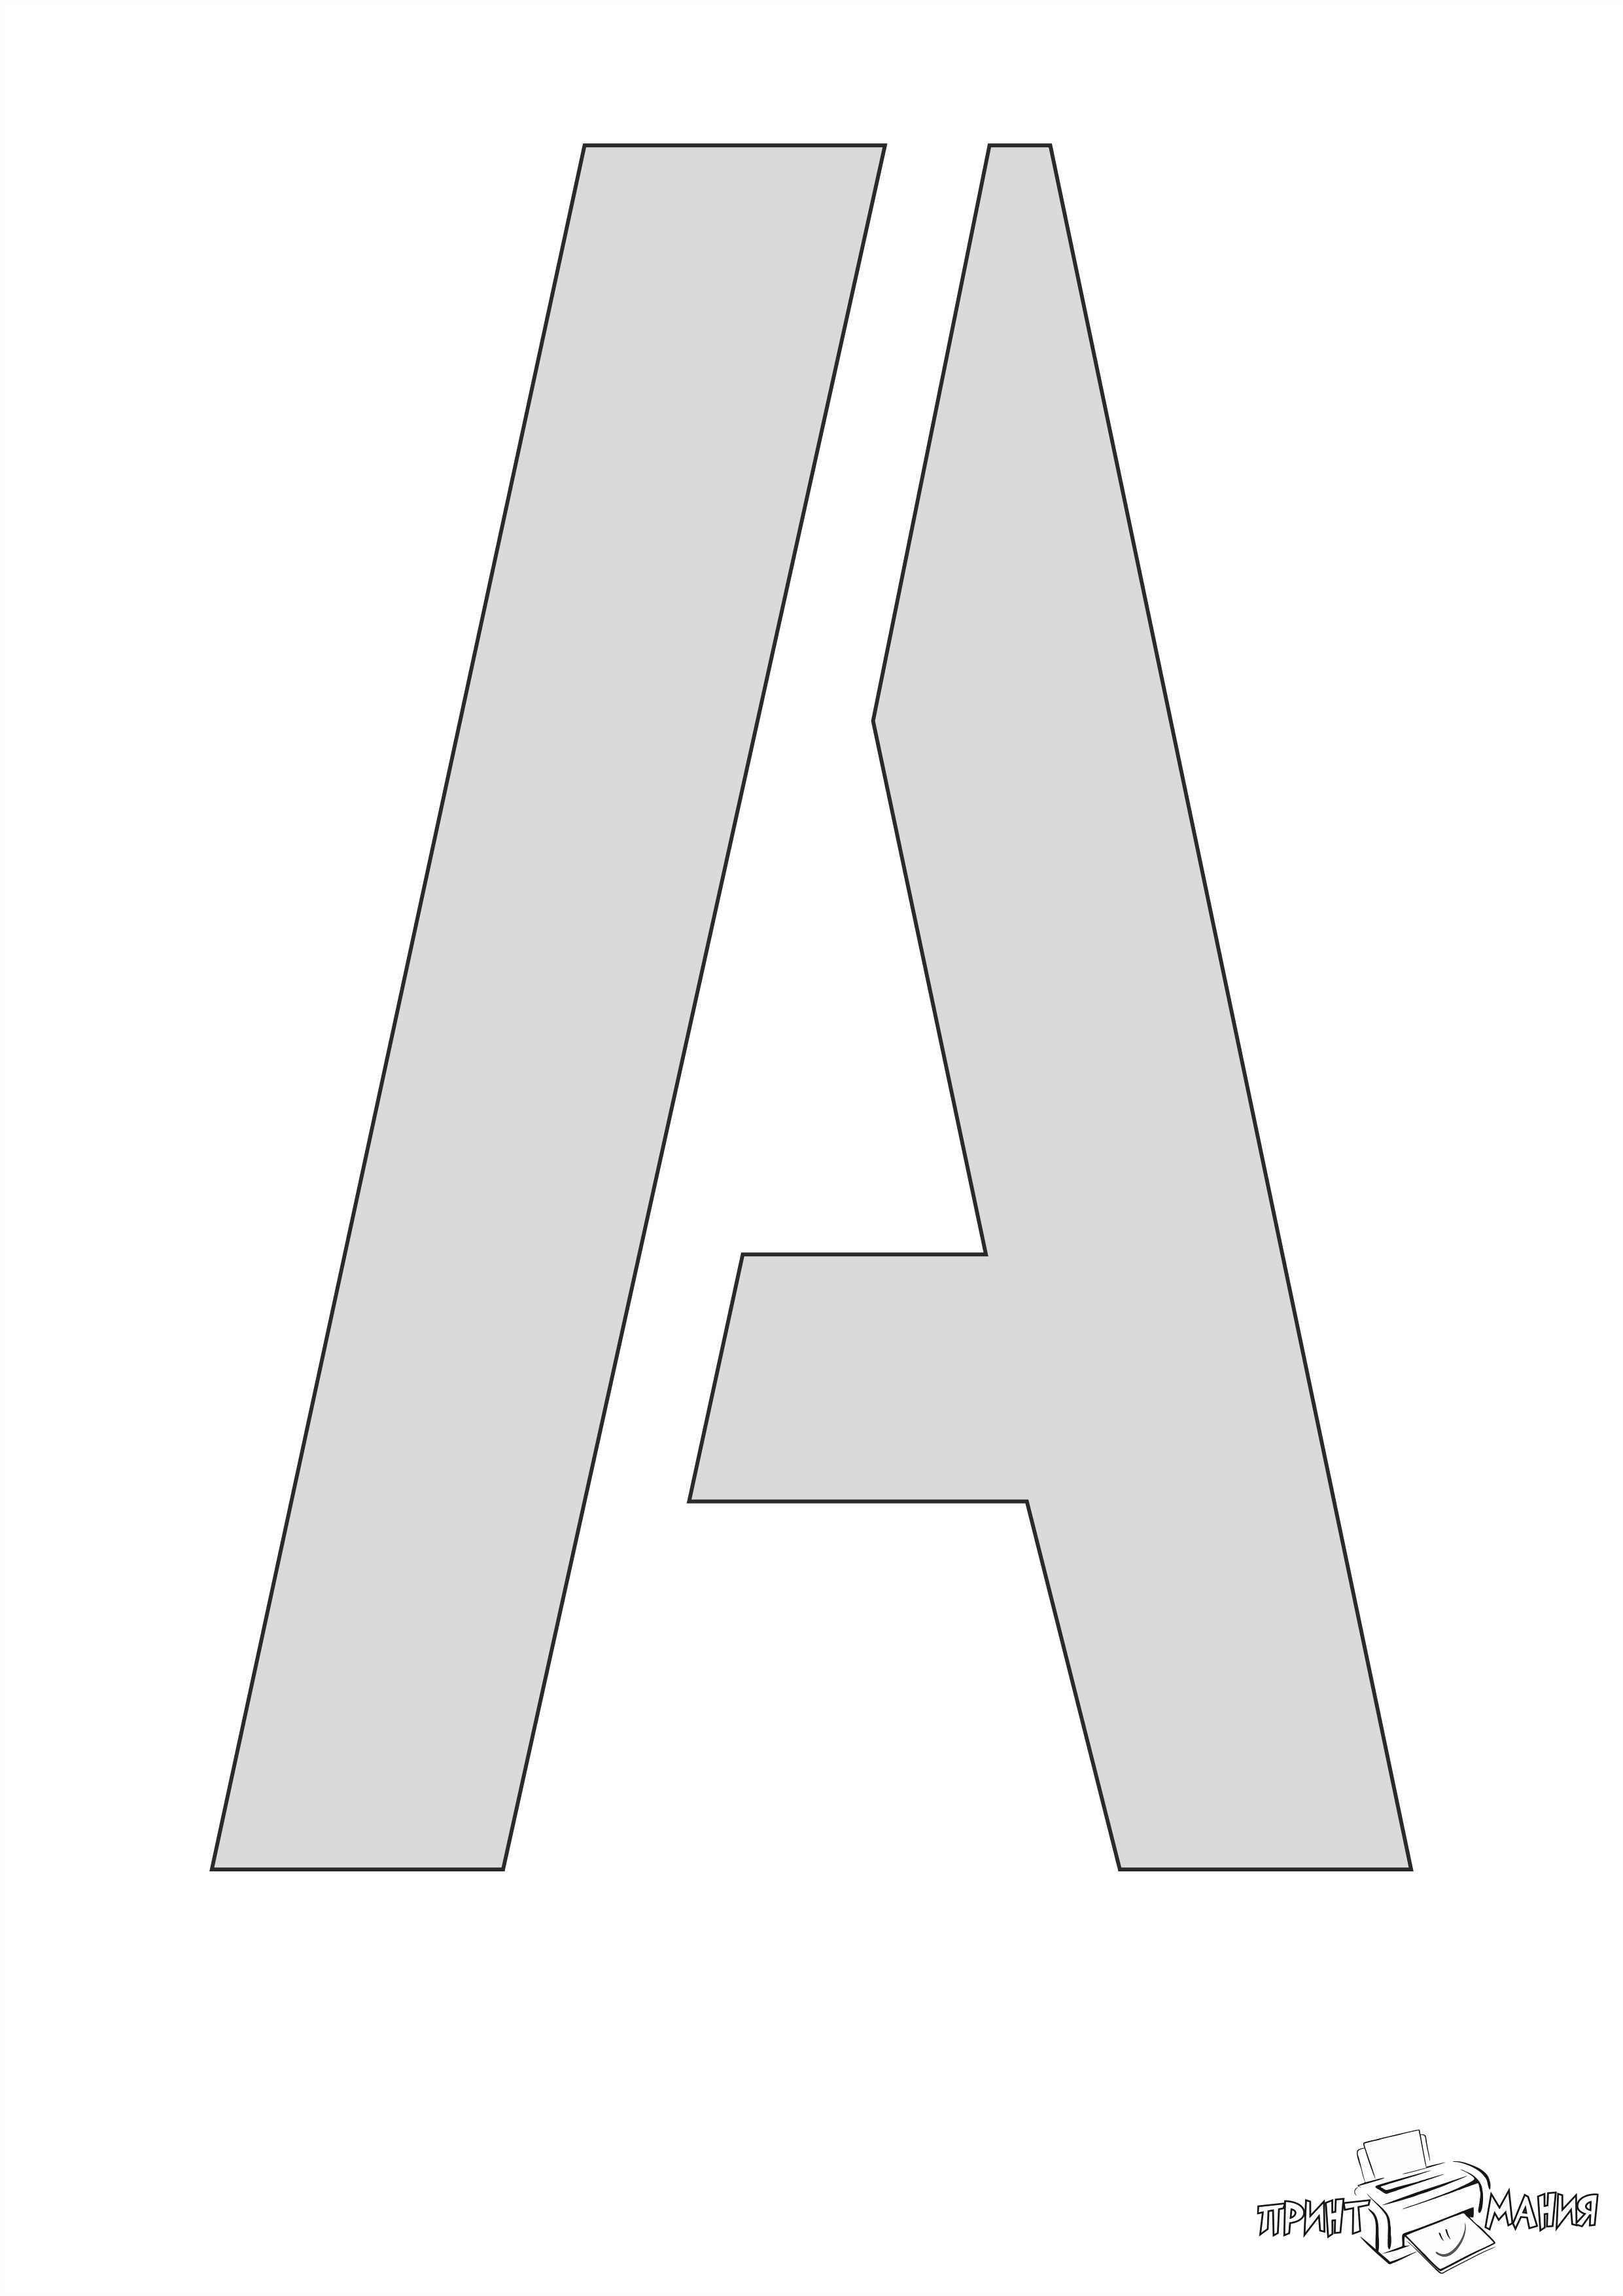 трафареты букв а5 для вырезания из бумаги шаблоны ип, работа разных